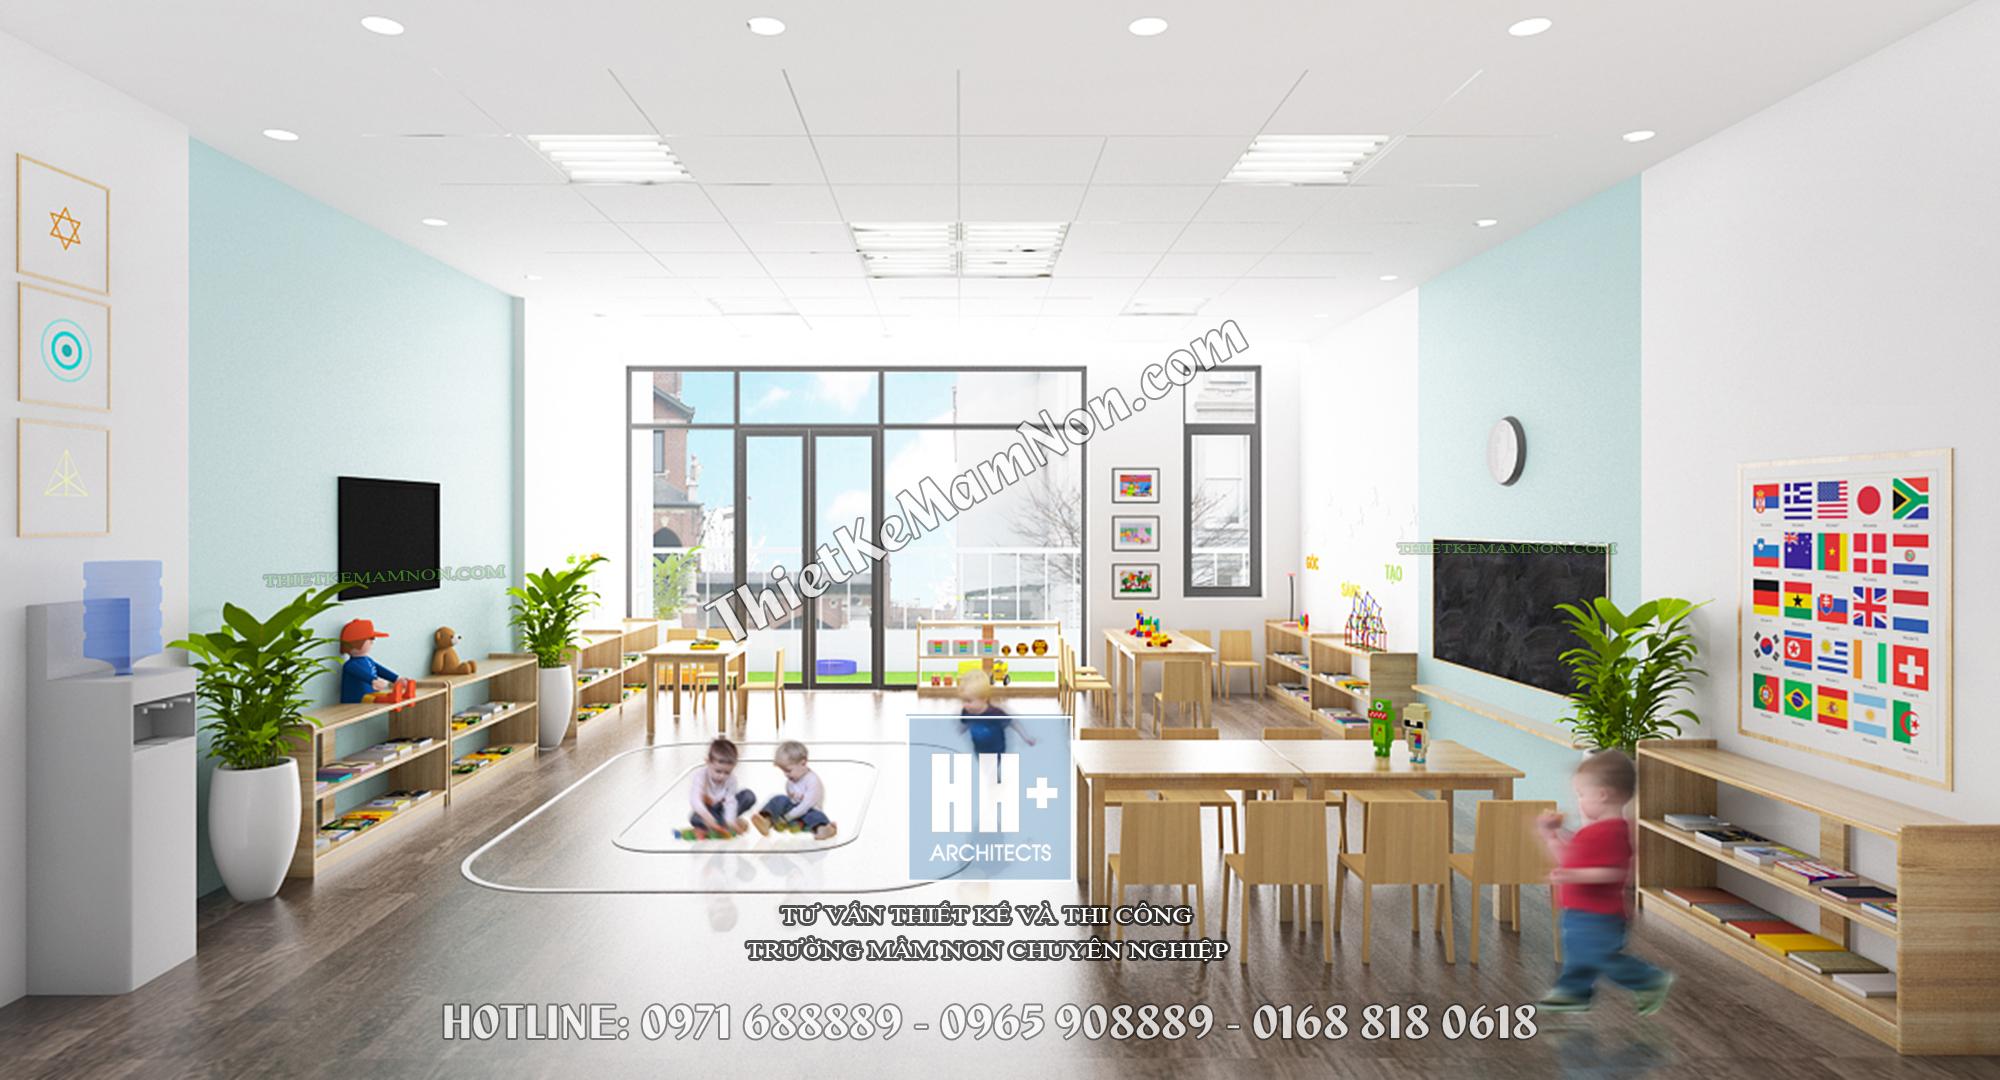 Thiết kế trường mầm non montessori thiết kế trường mầm non montessori Thiết kế trường mầm non montessori Kinder Home 6 3